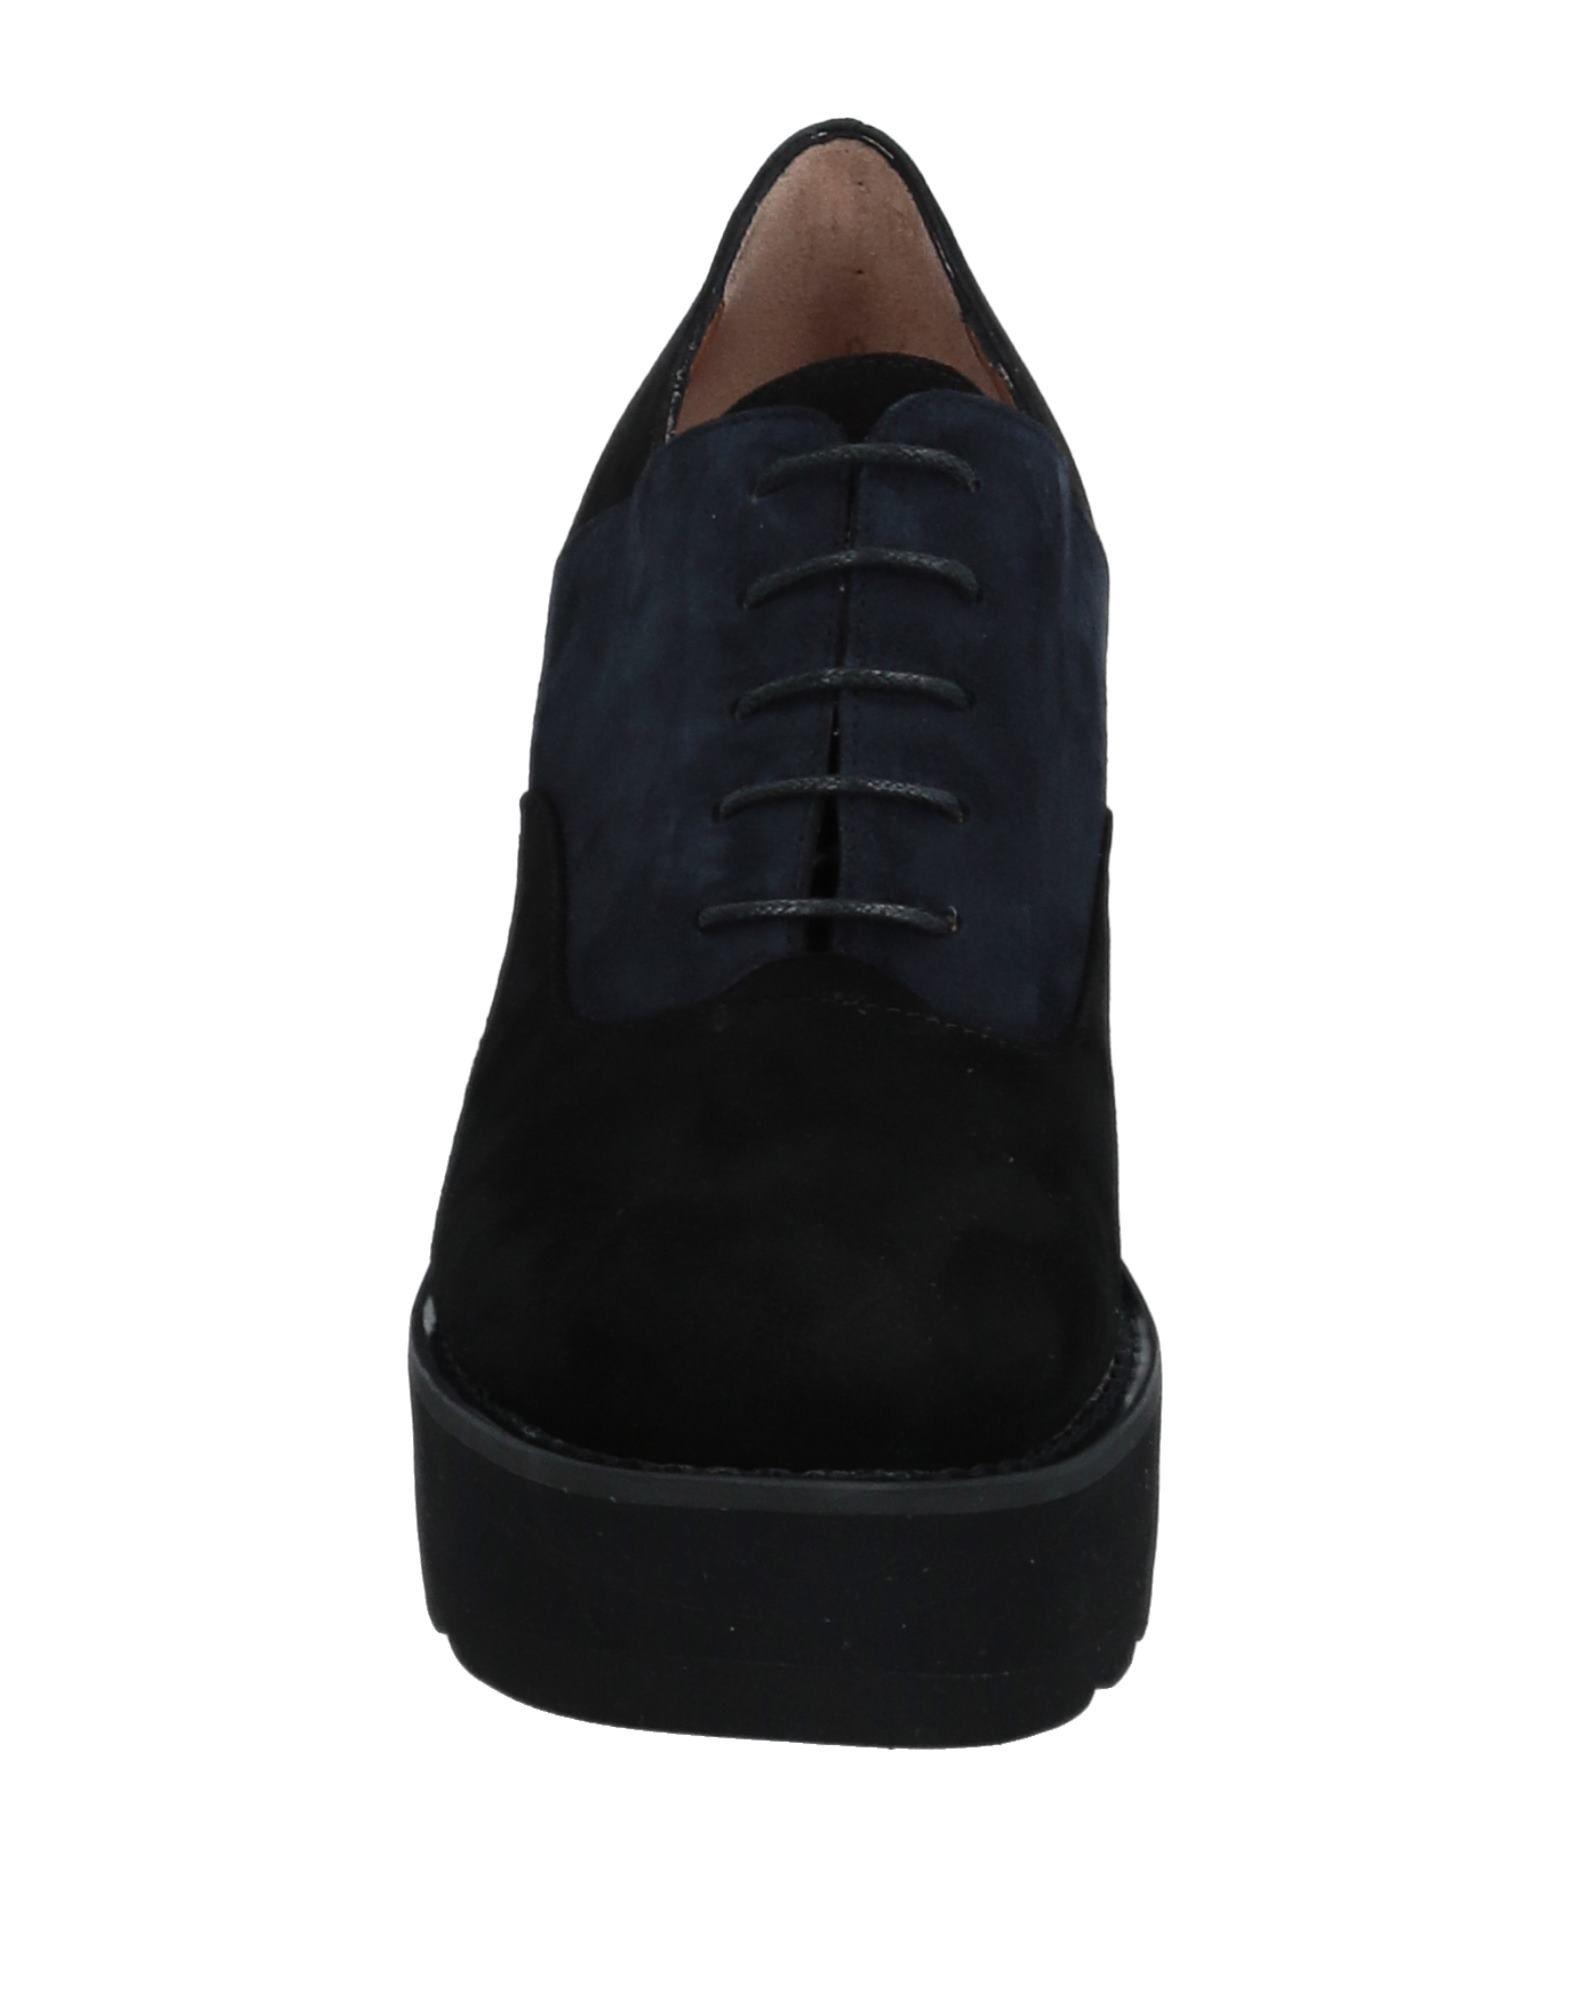 Stilvolle Schnürschuhe billige Schuhe F.Lli Bruglia Schnürschuhe Stilvolle Damen  11517885SC 283382